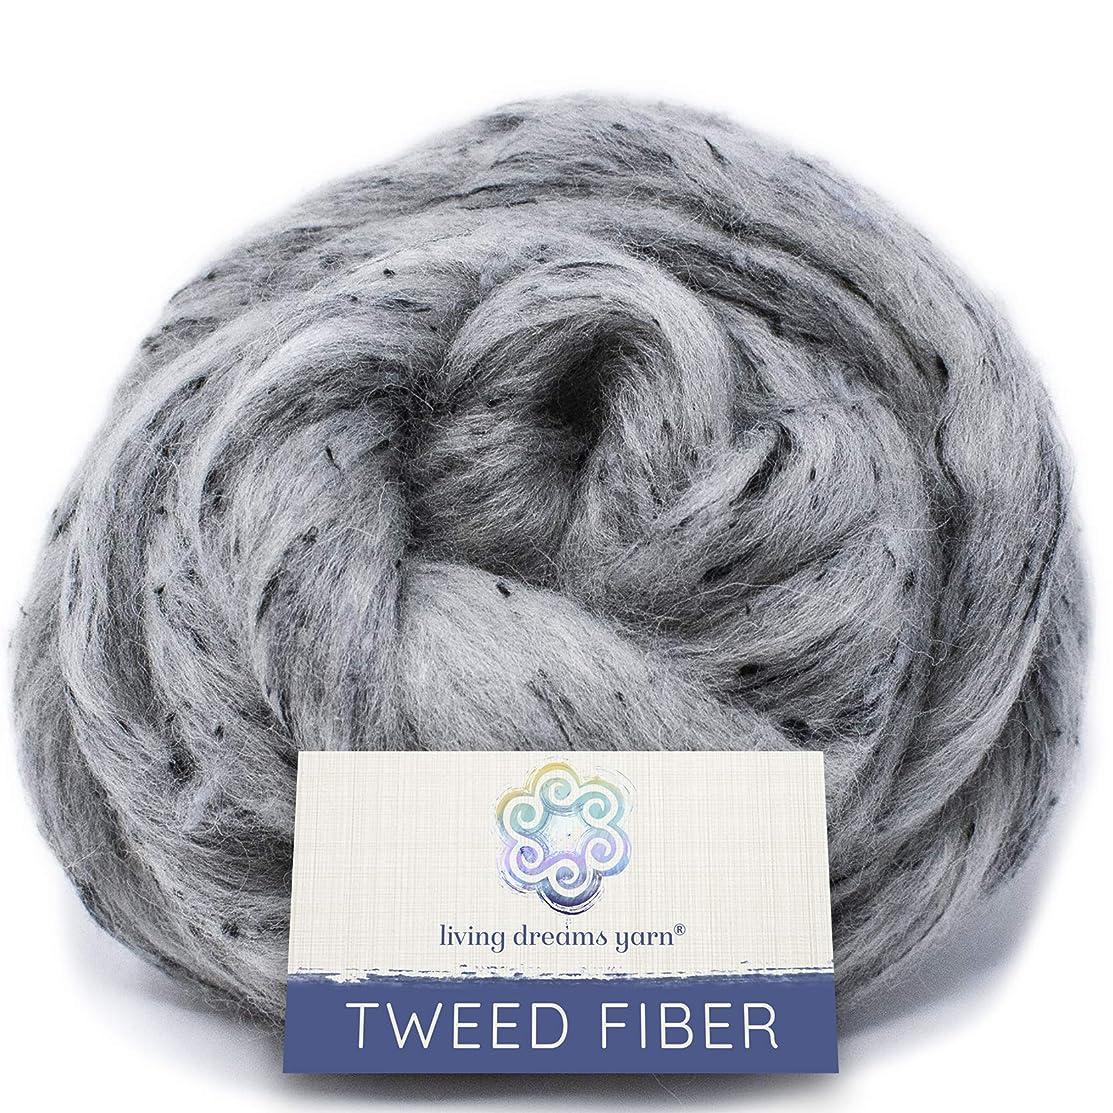 Tweed Effect Fiber for Spinning, Felting, Blending and Dyeing. Super Soft Wool & Viscose Blend. Combed Top Roving. Sherlock Holmes